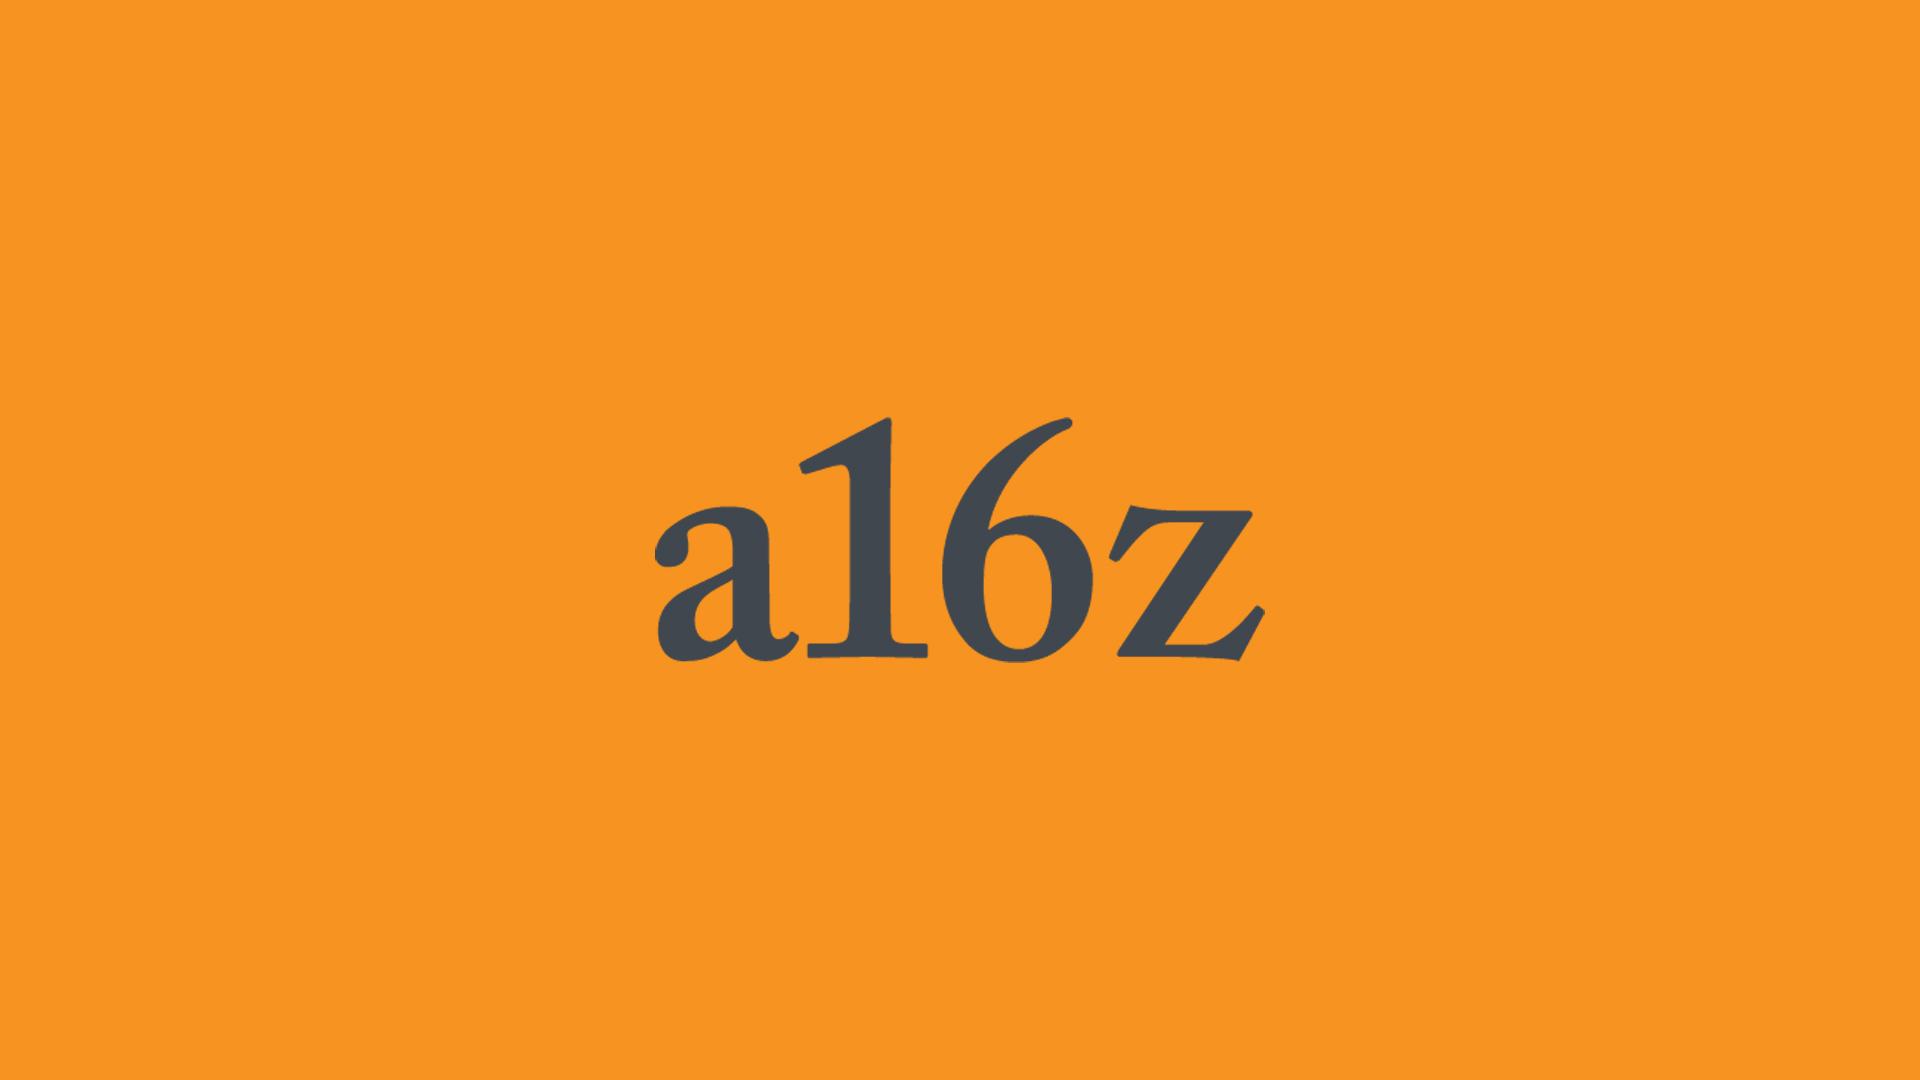 a16z صندوق سرمایهگذاری رمز ارز تاسیس میکند